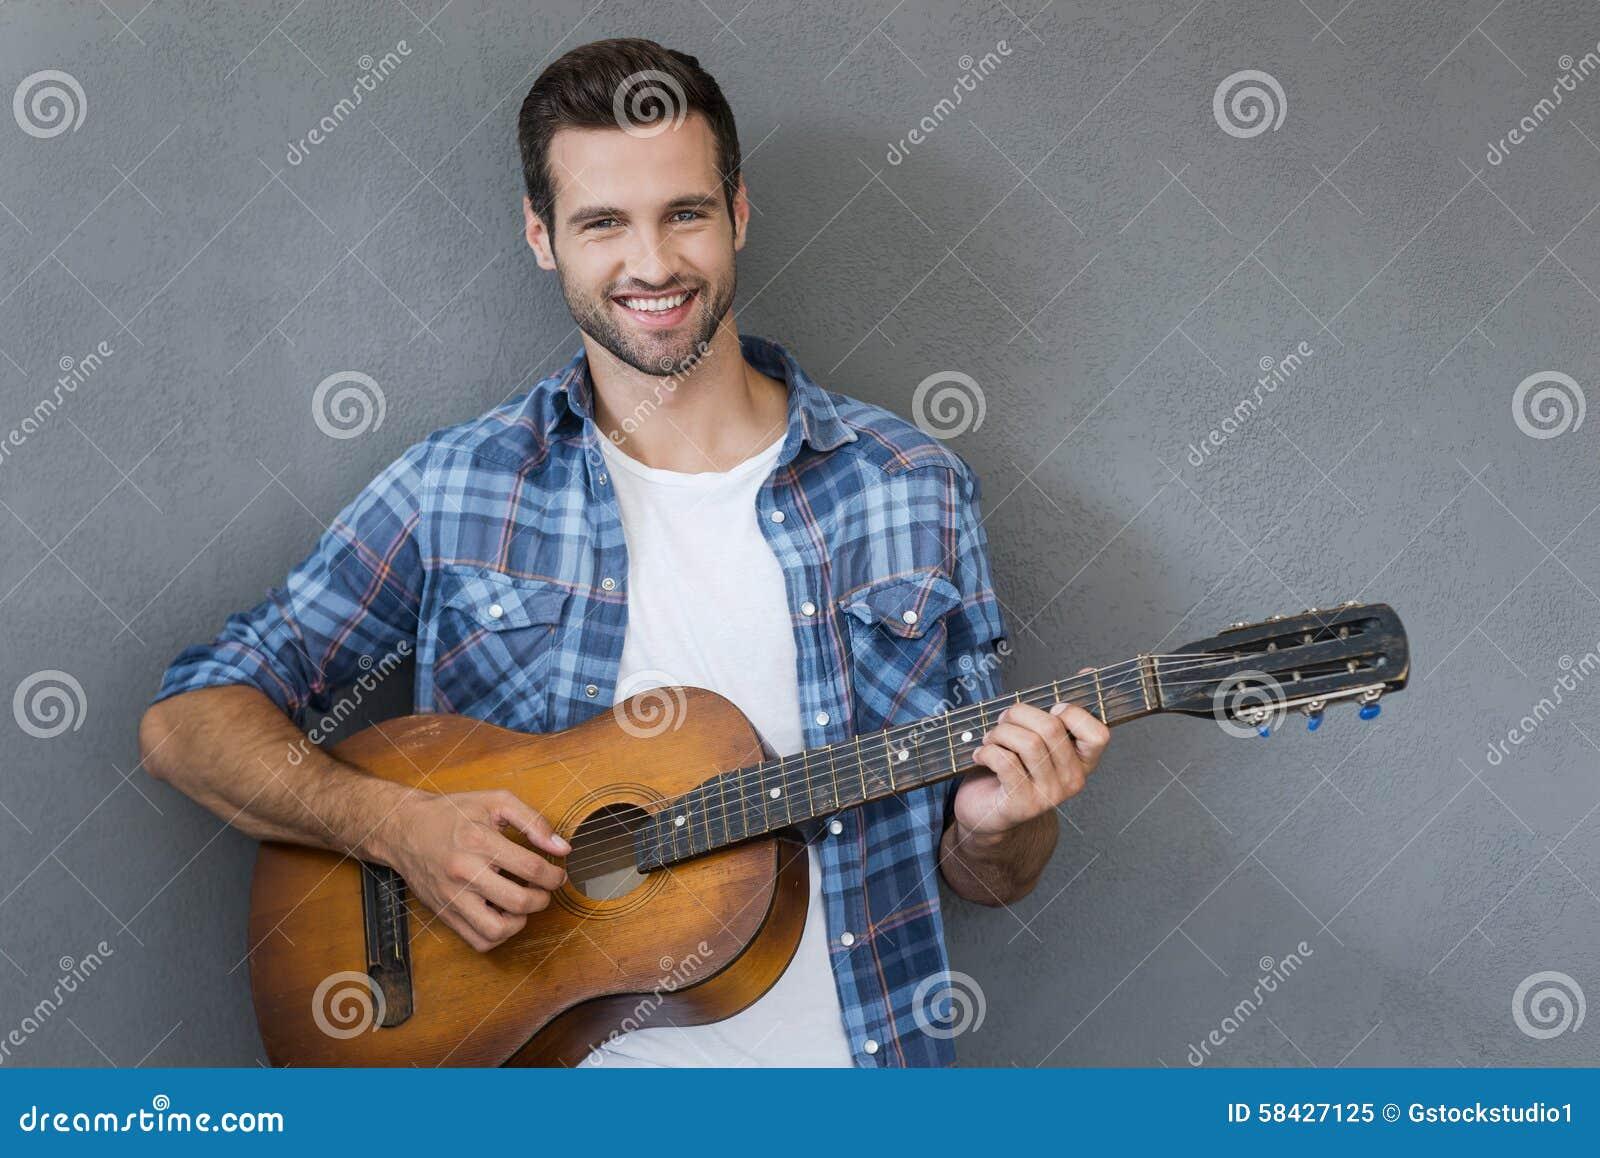 Guitar playing dude fucks a hot country girl 7